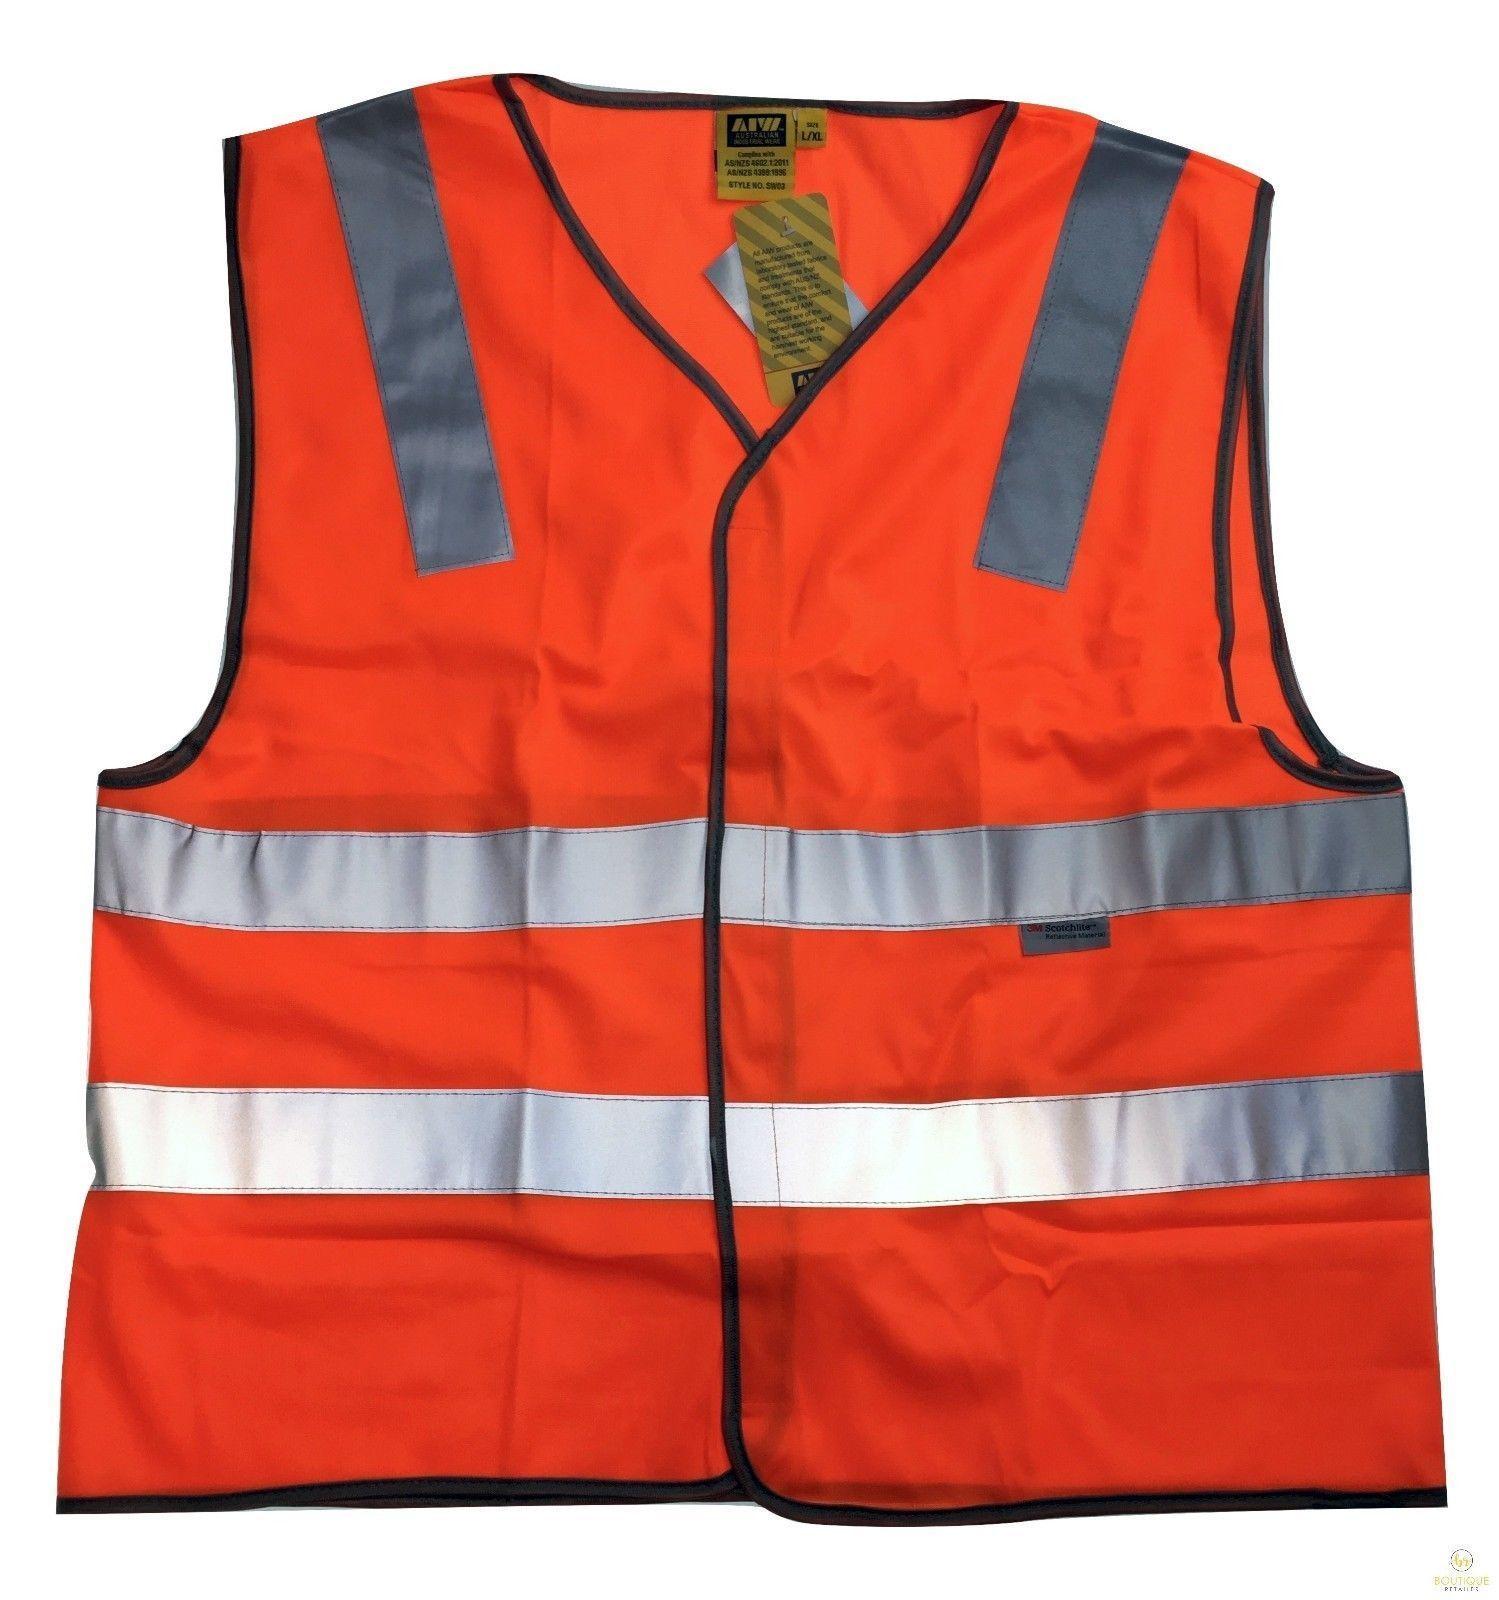 3M Reflective Tape Hi Vis Safety VEST Workwear Night & Day Use Safety Visibility